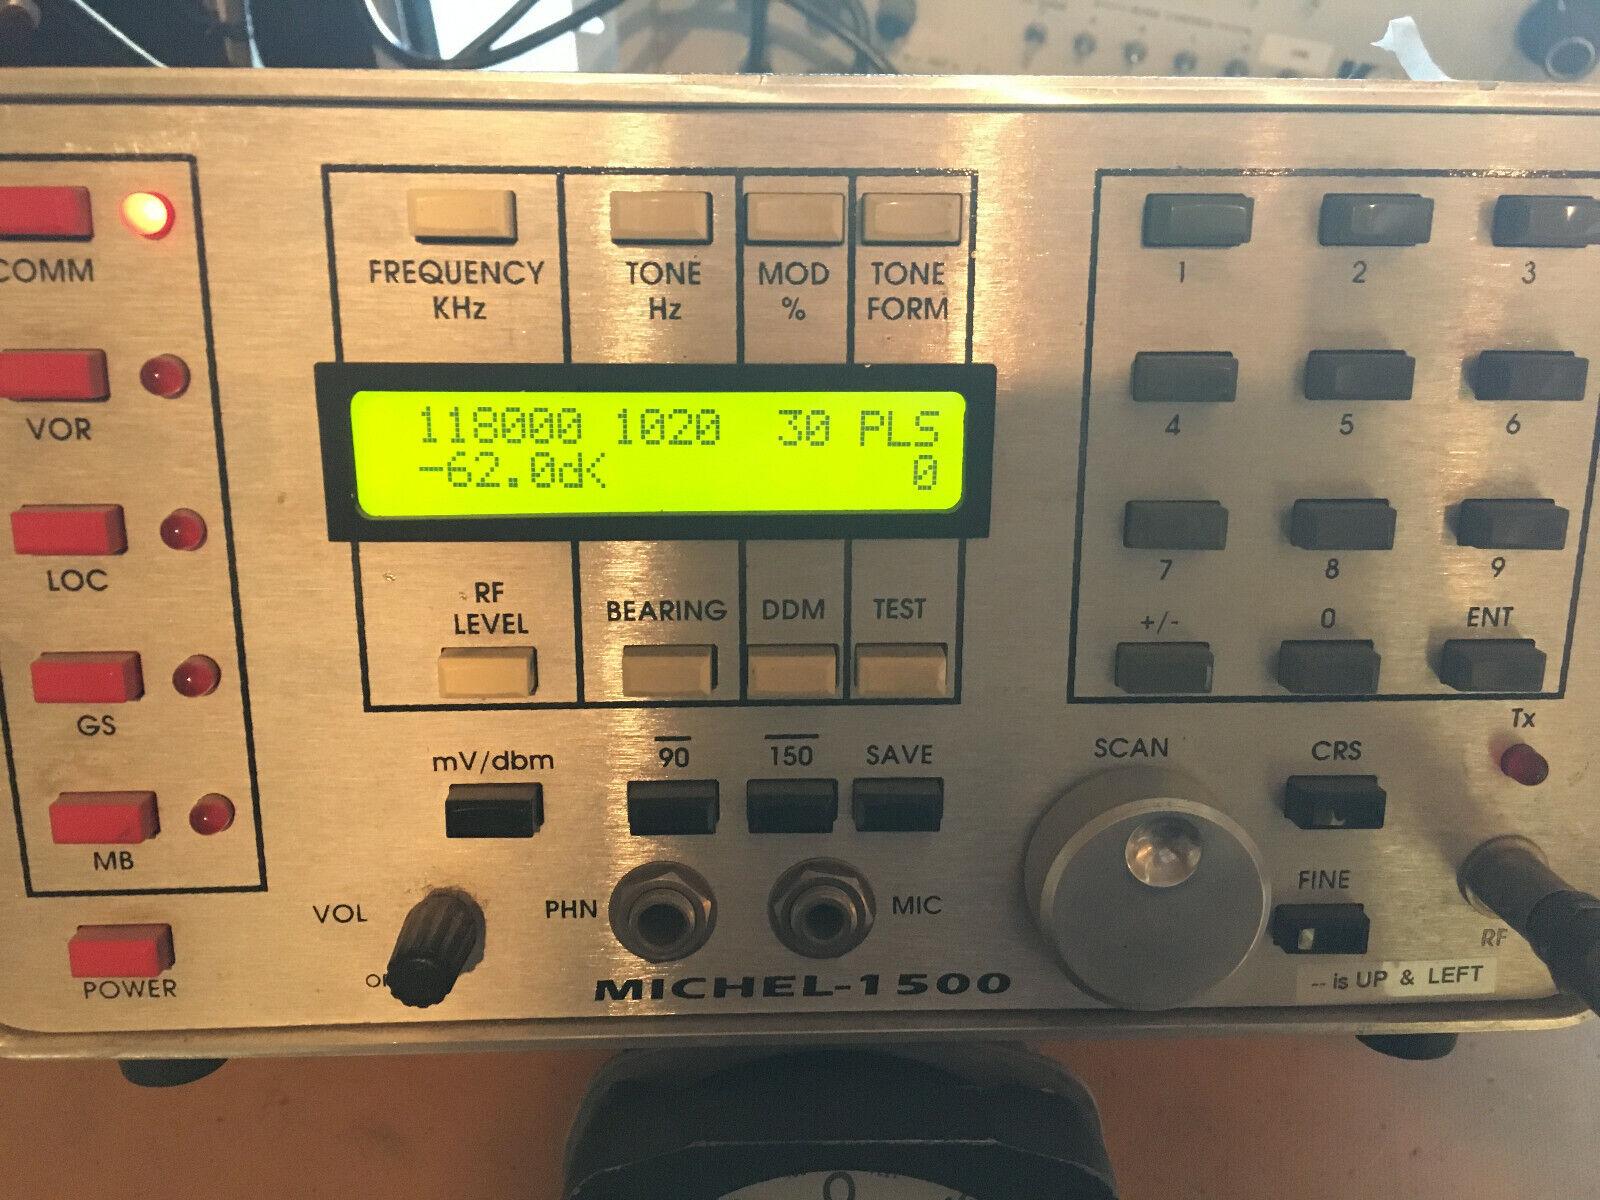 Michel MEC-1500 Nav Com ILS & MB Bench or Ramp Signal Generator